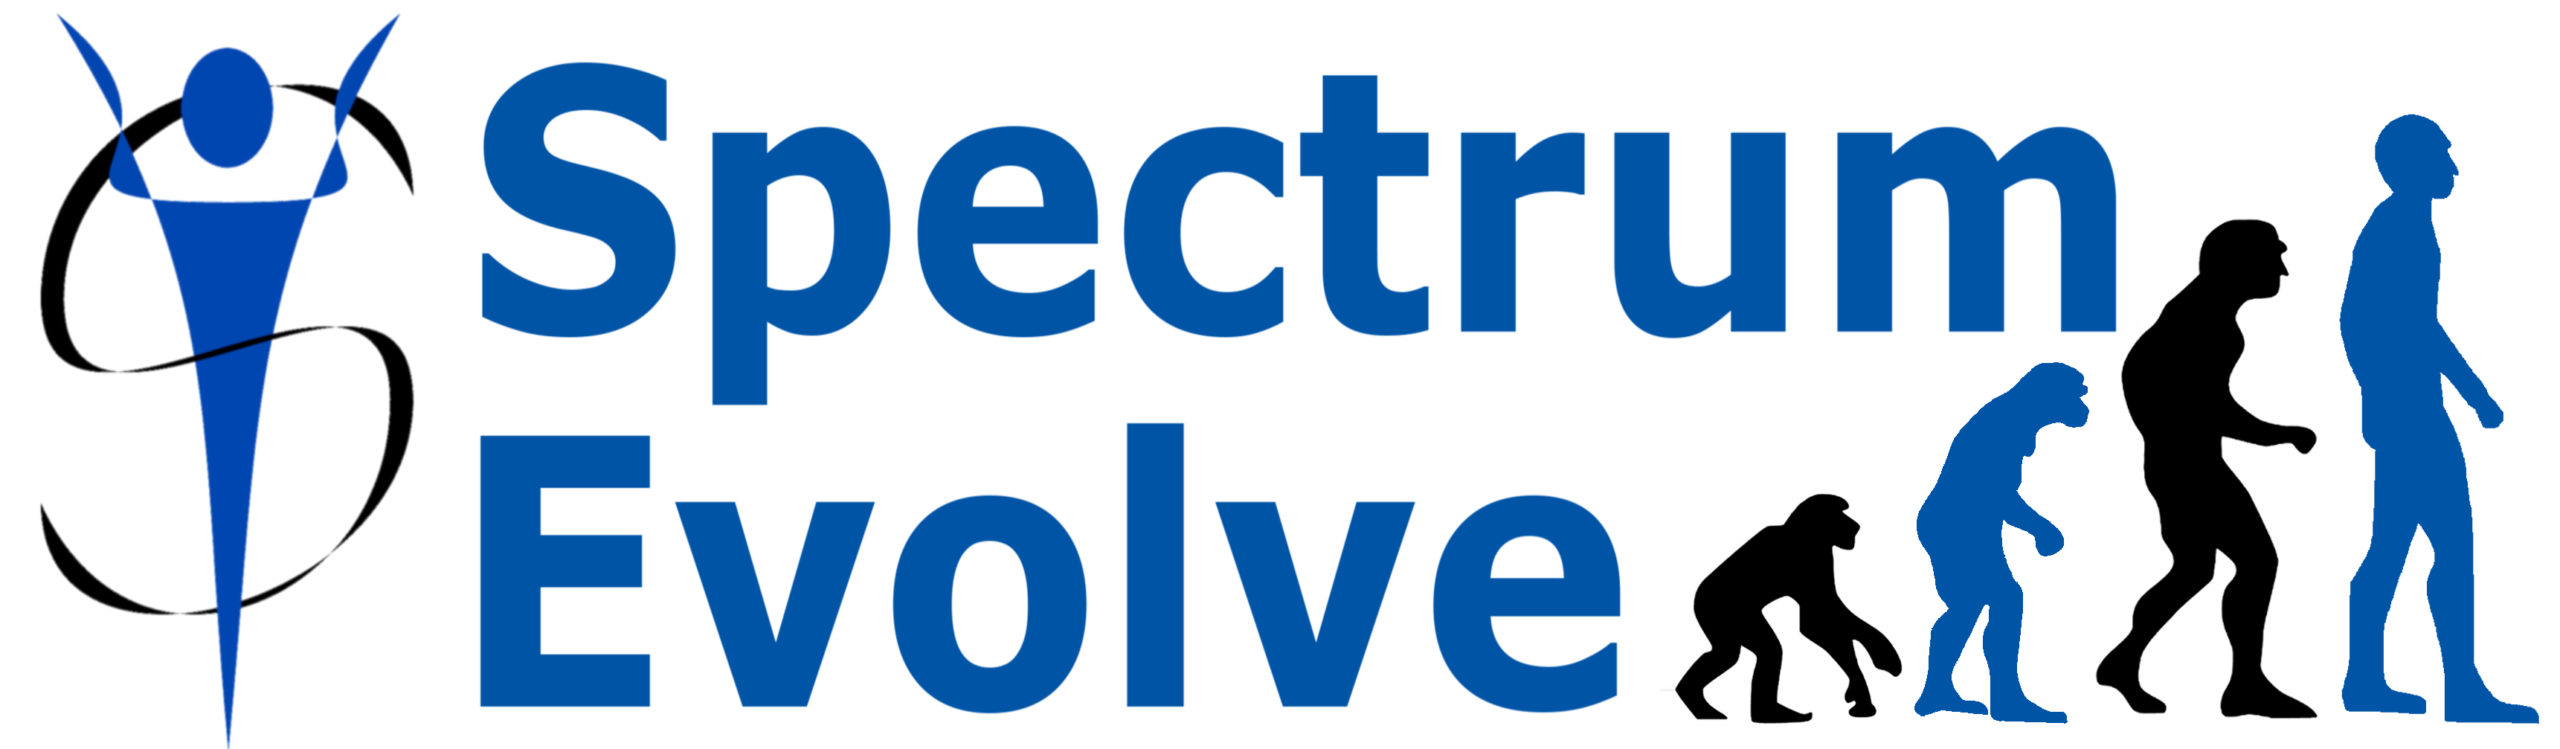 Spectrum-Evolve